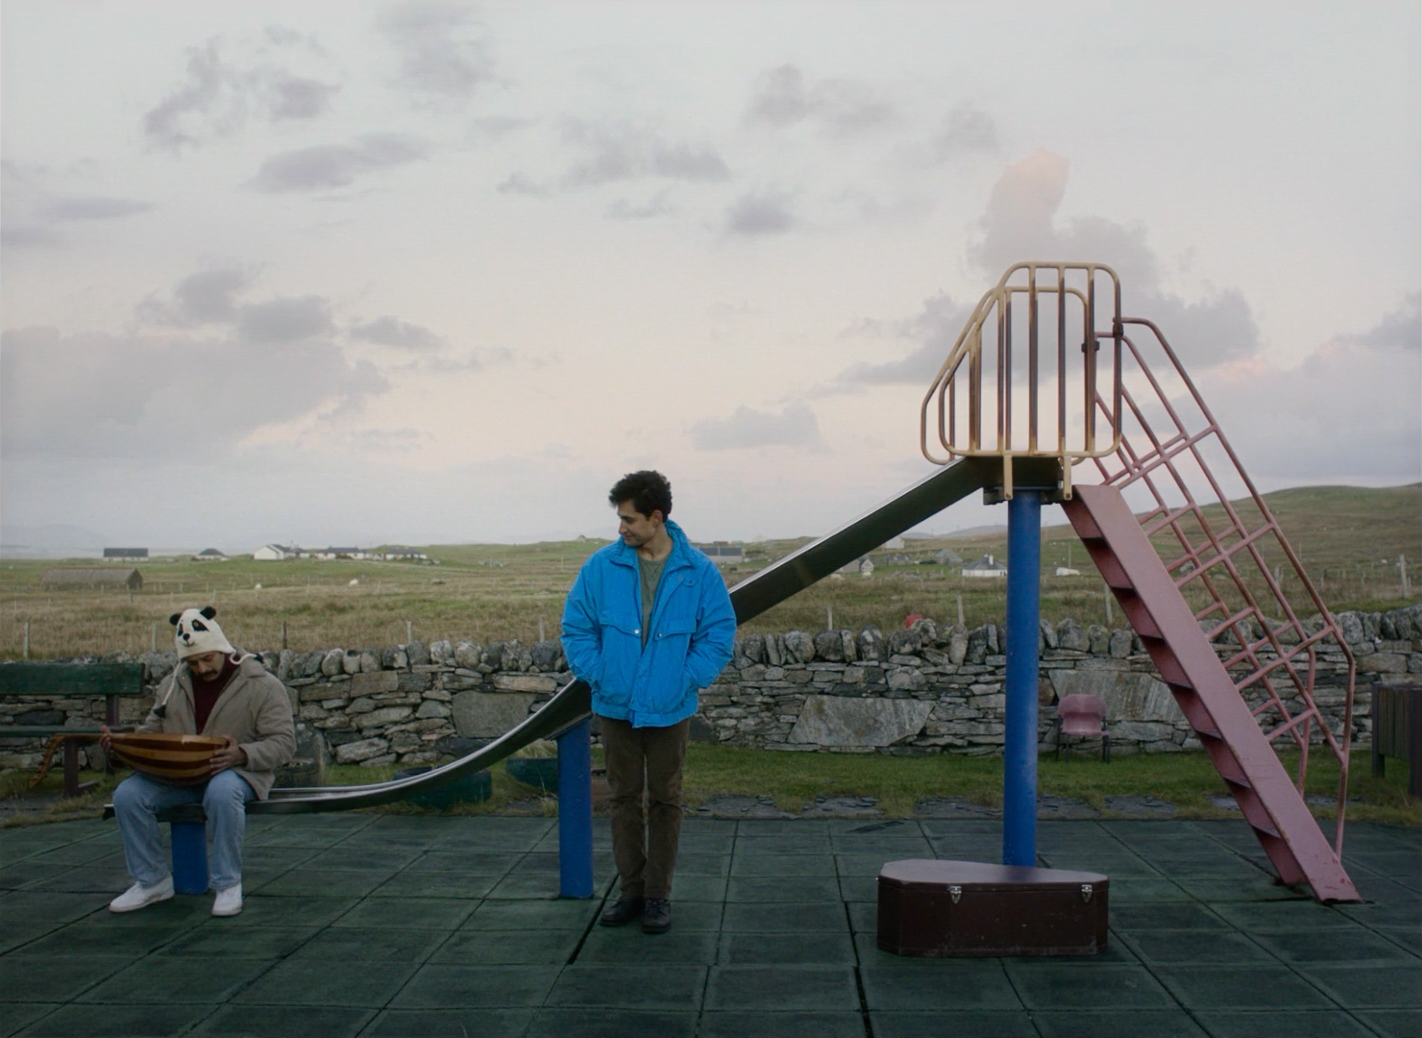 Vikash Bhai and Amir El-Masry find connection on a remote Scottish isle